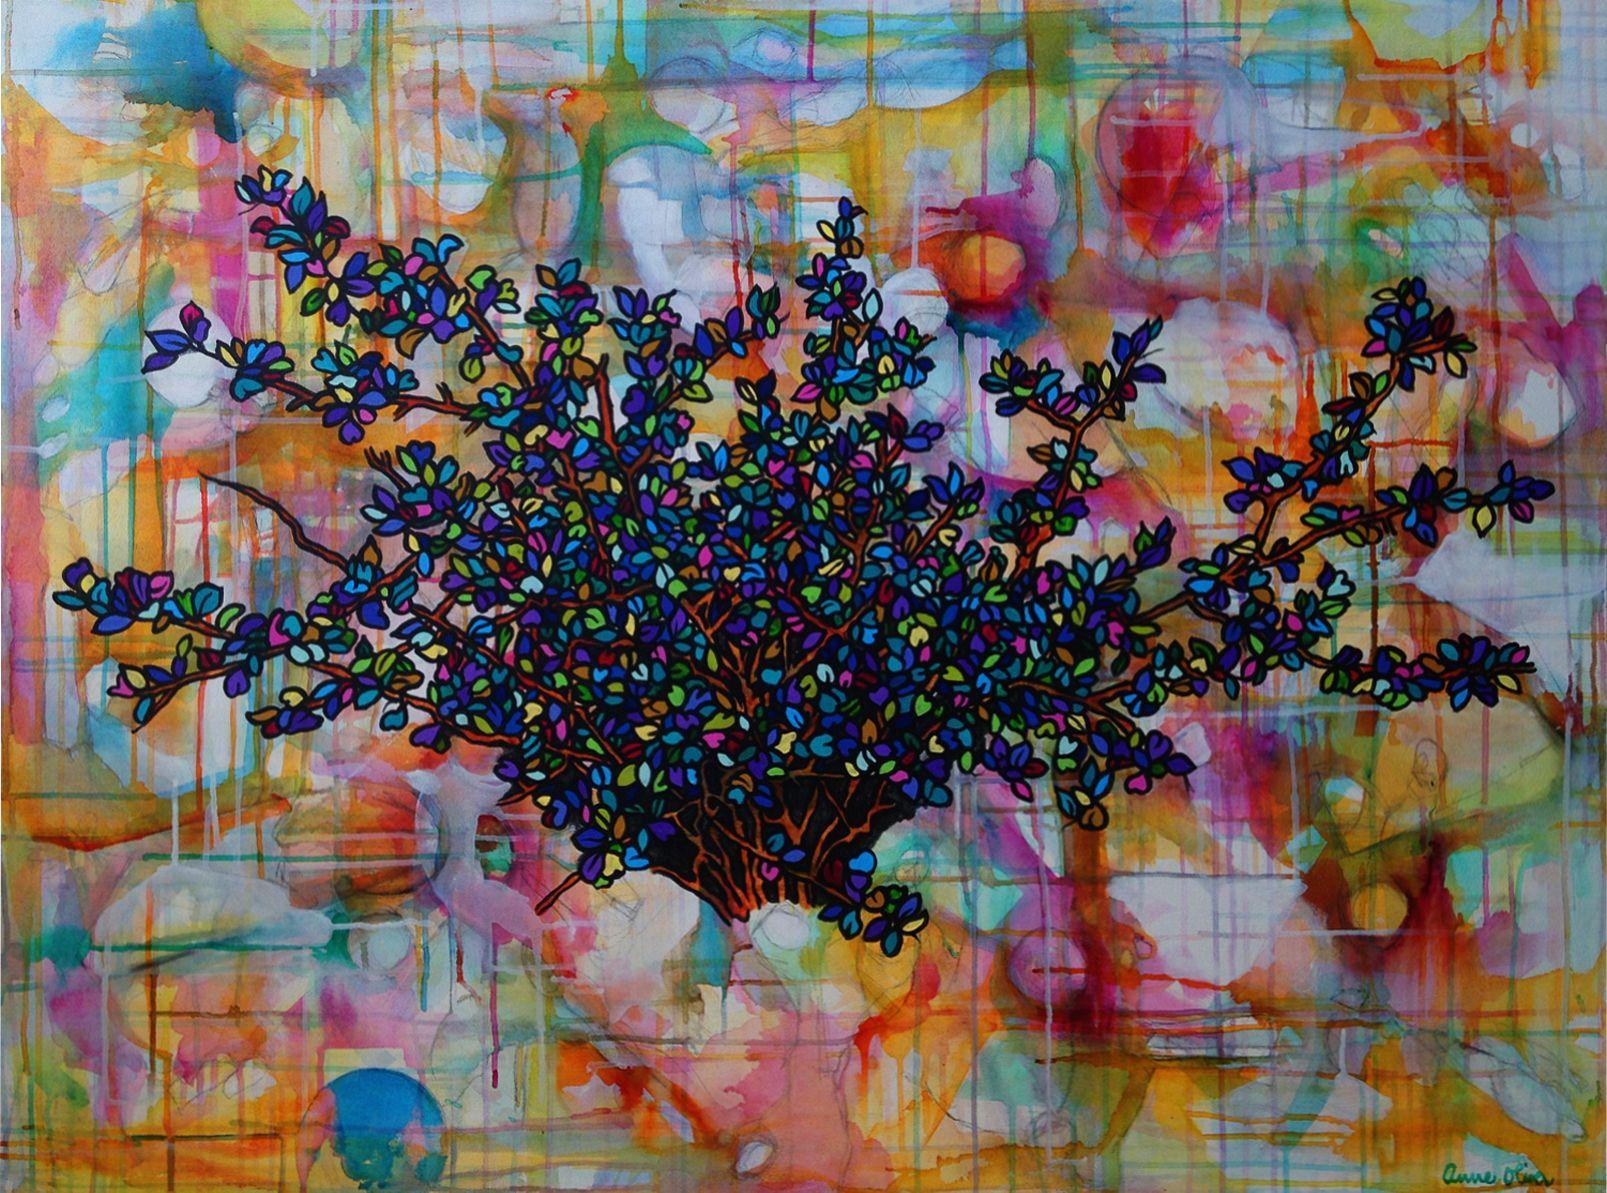 Secret Garden II, Painting, Acrylic on Canvas